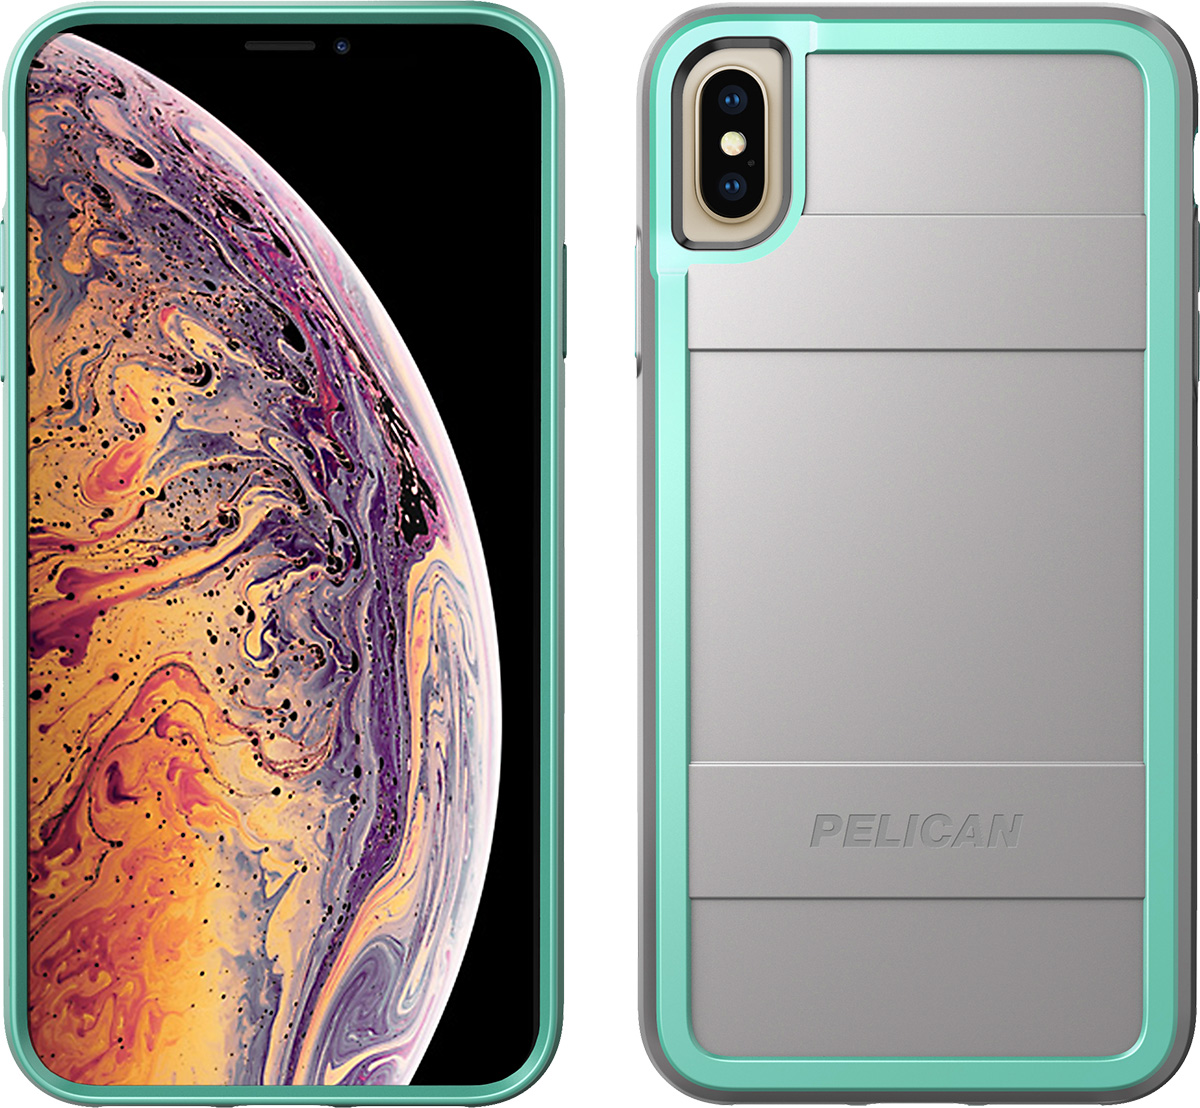 pelican apple iphone c43000 protector grey aqua phone case